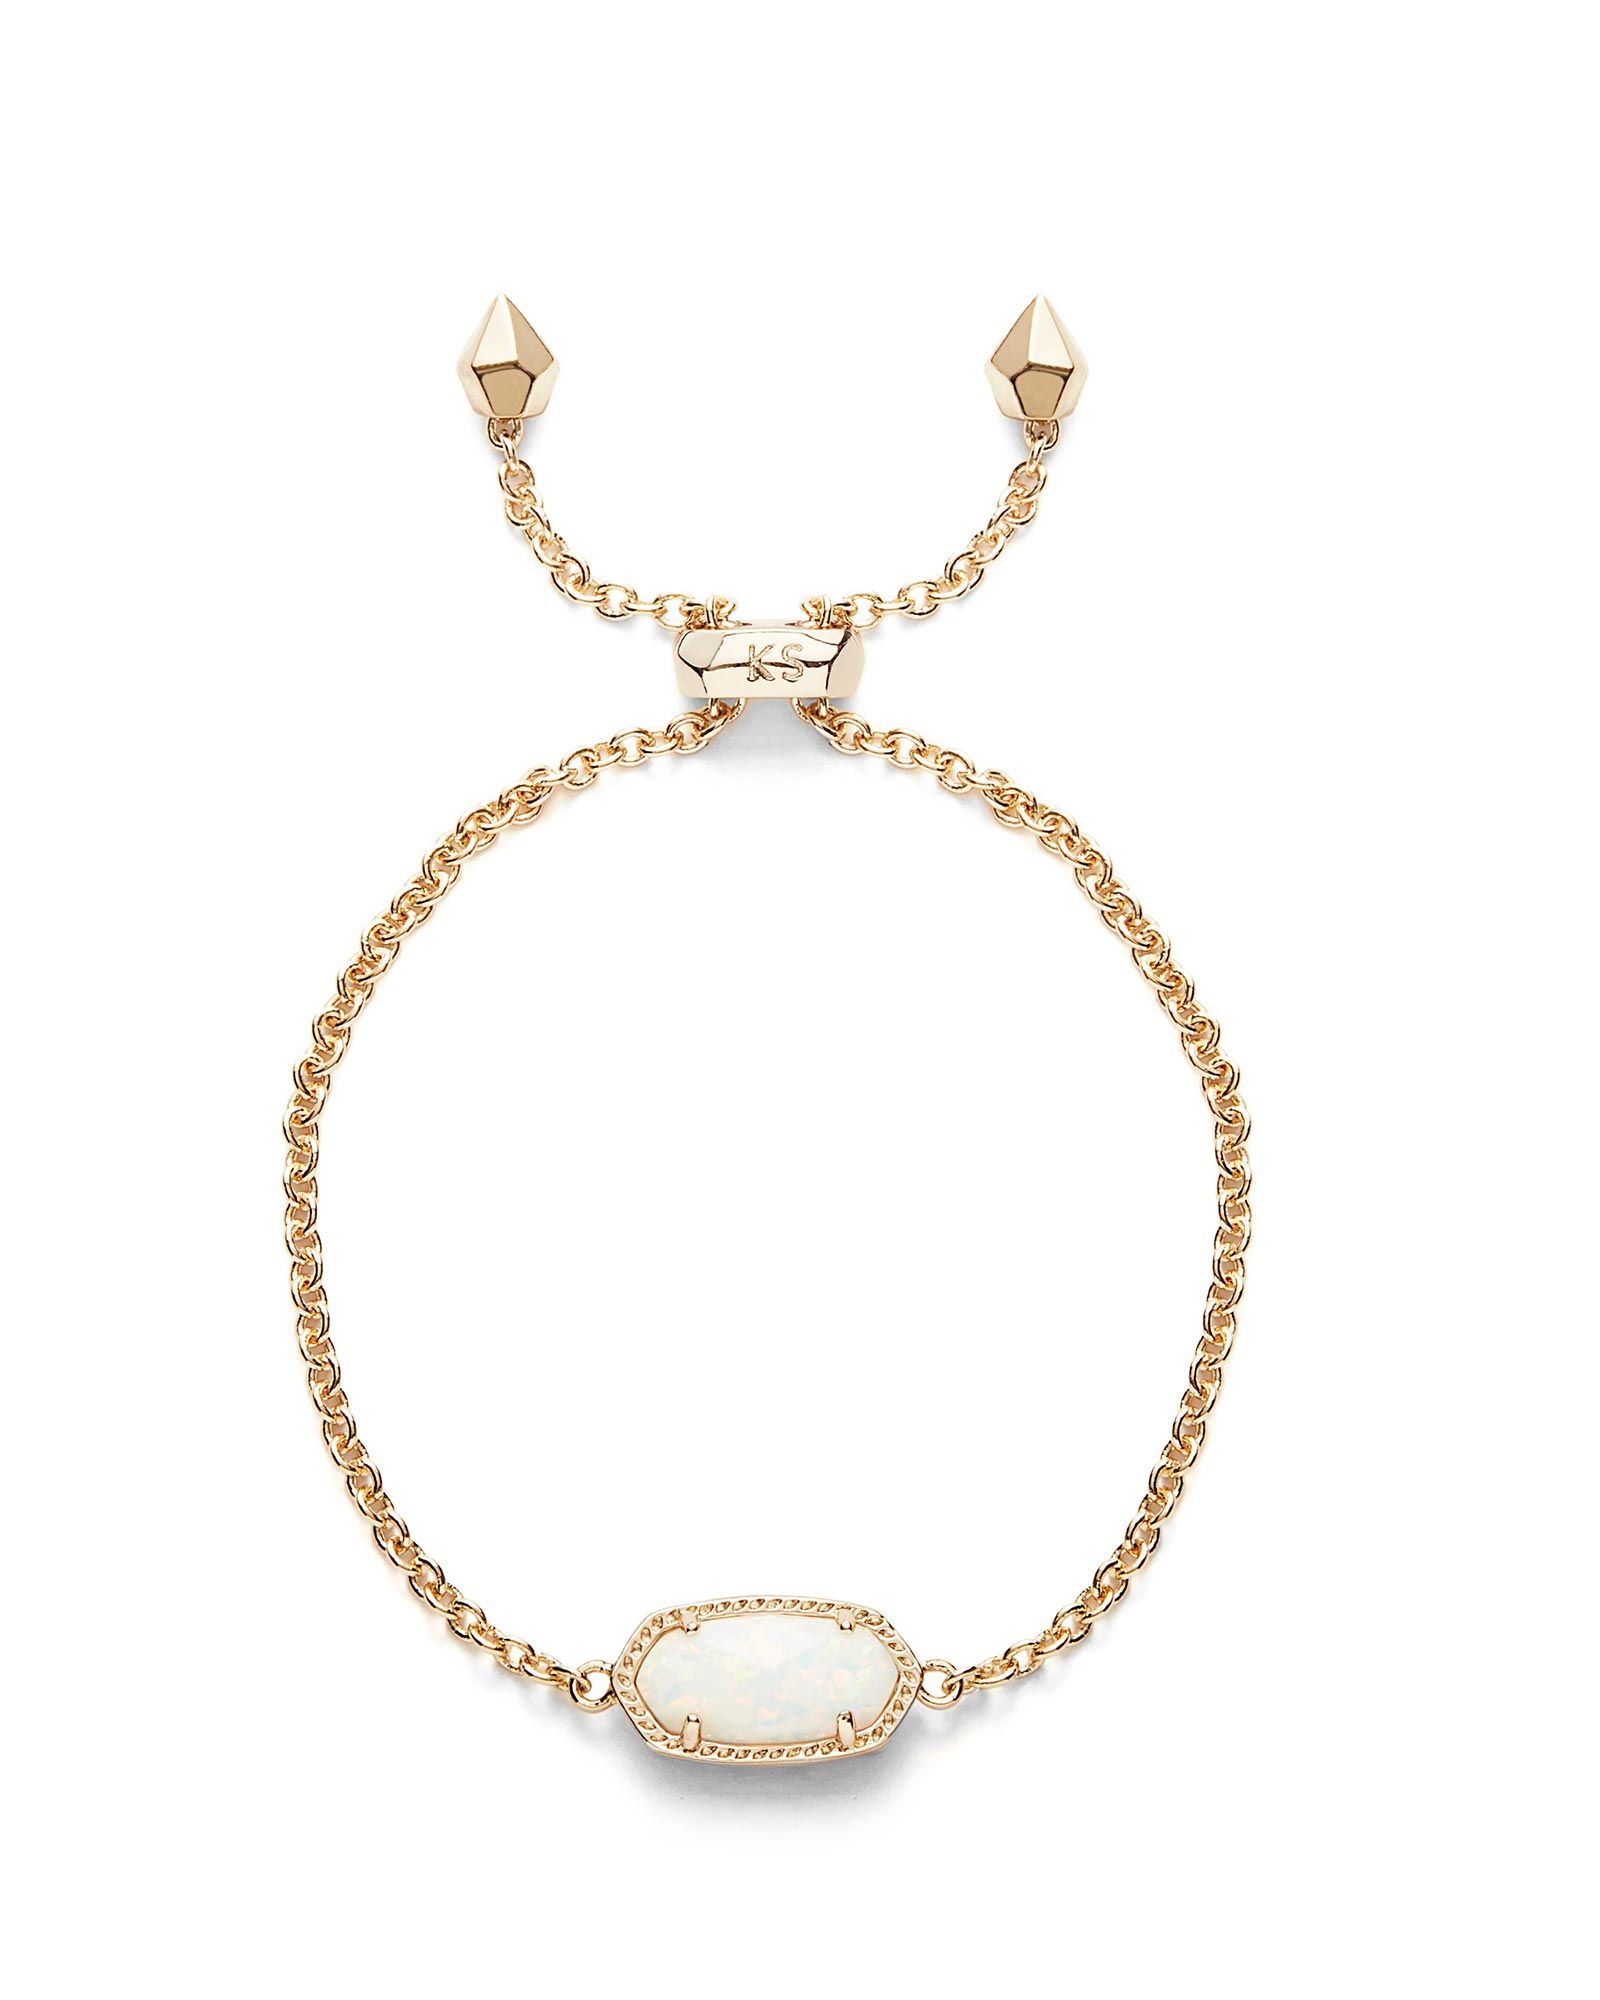 Kendra Scott Elaina Statement Bracelet in Rose Gold Plate YYEKoJ9